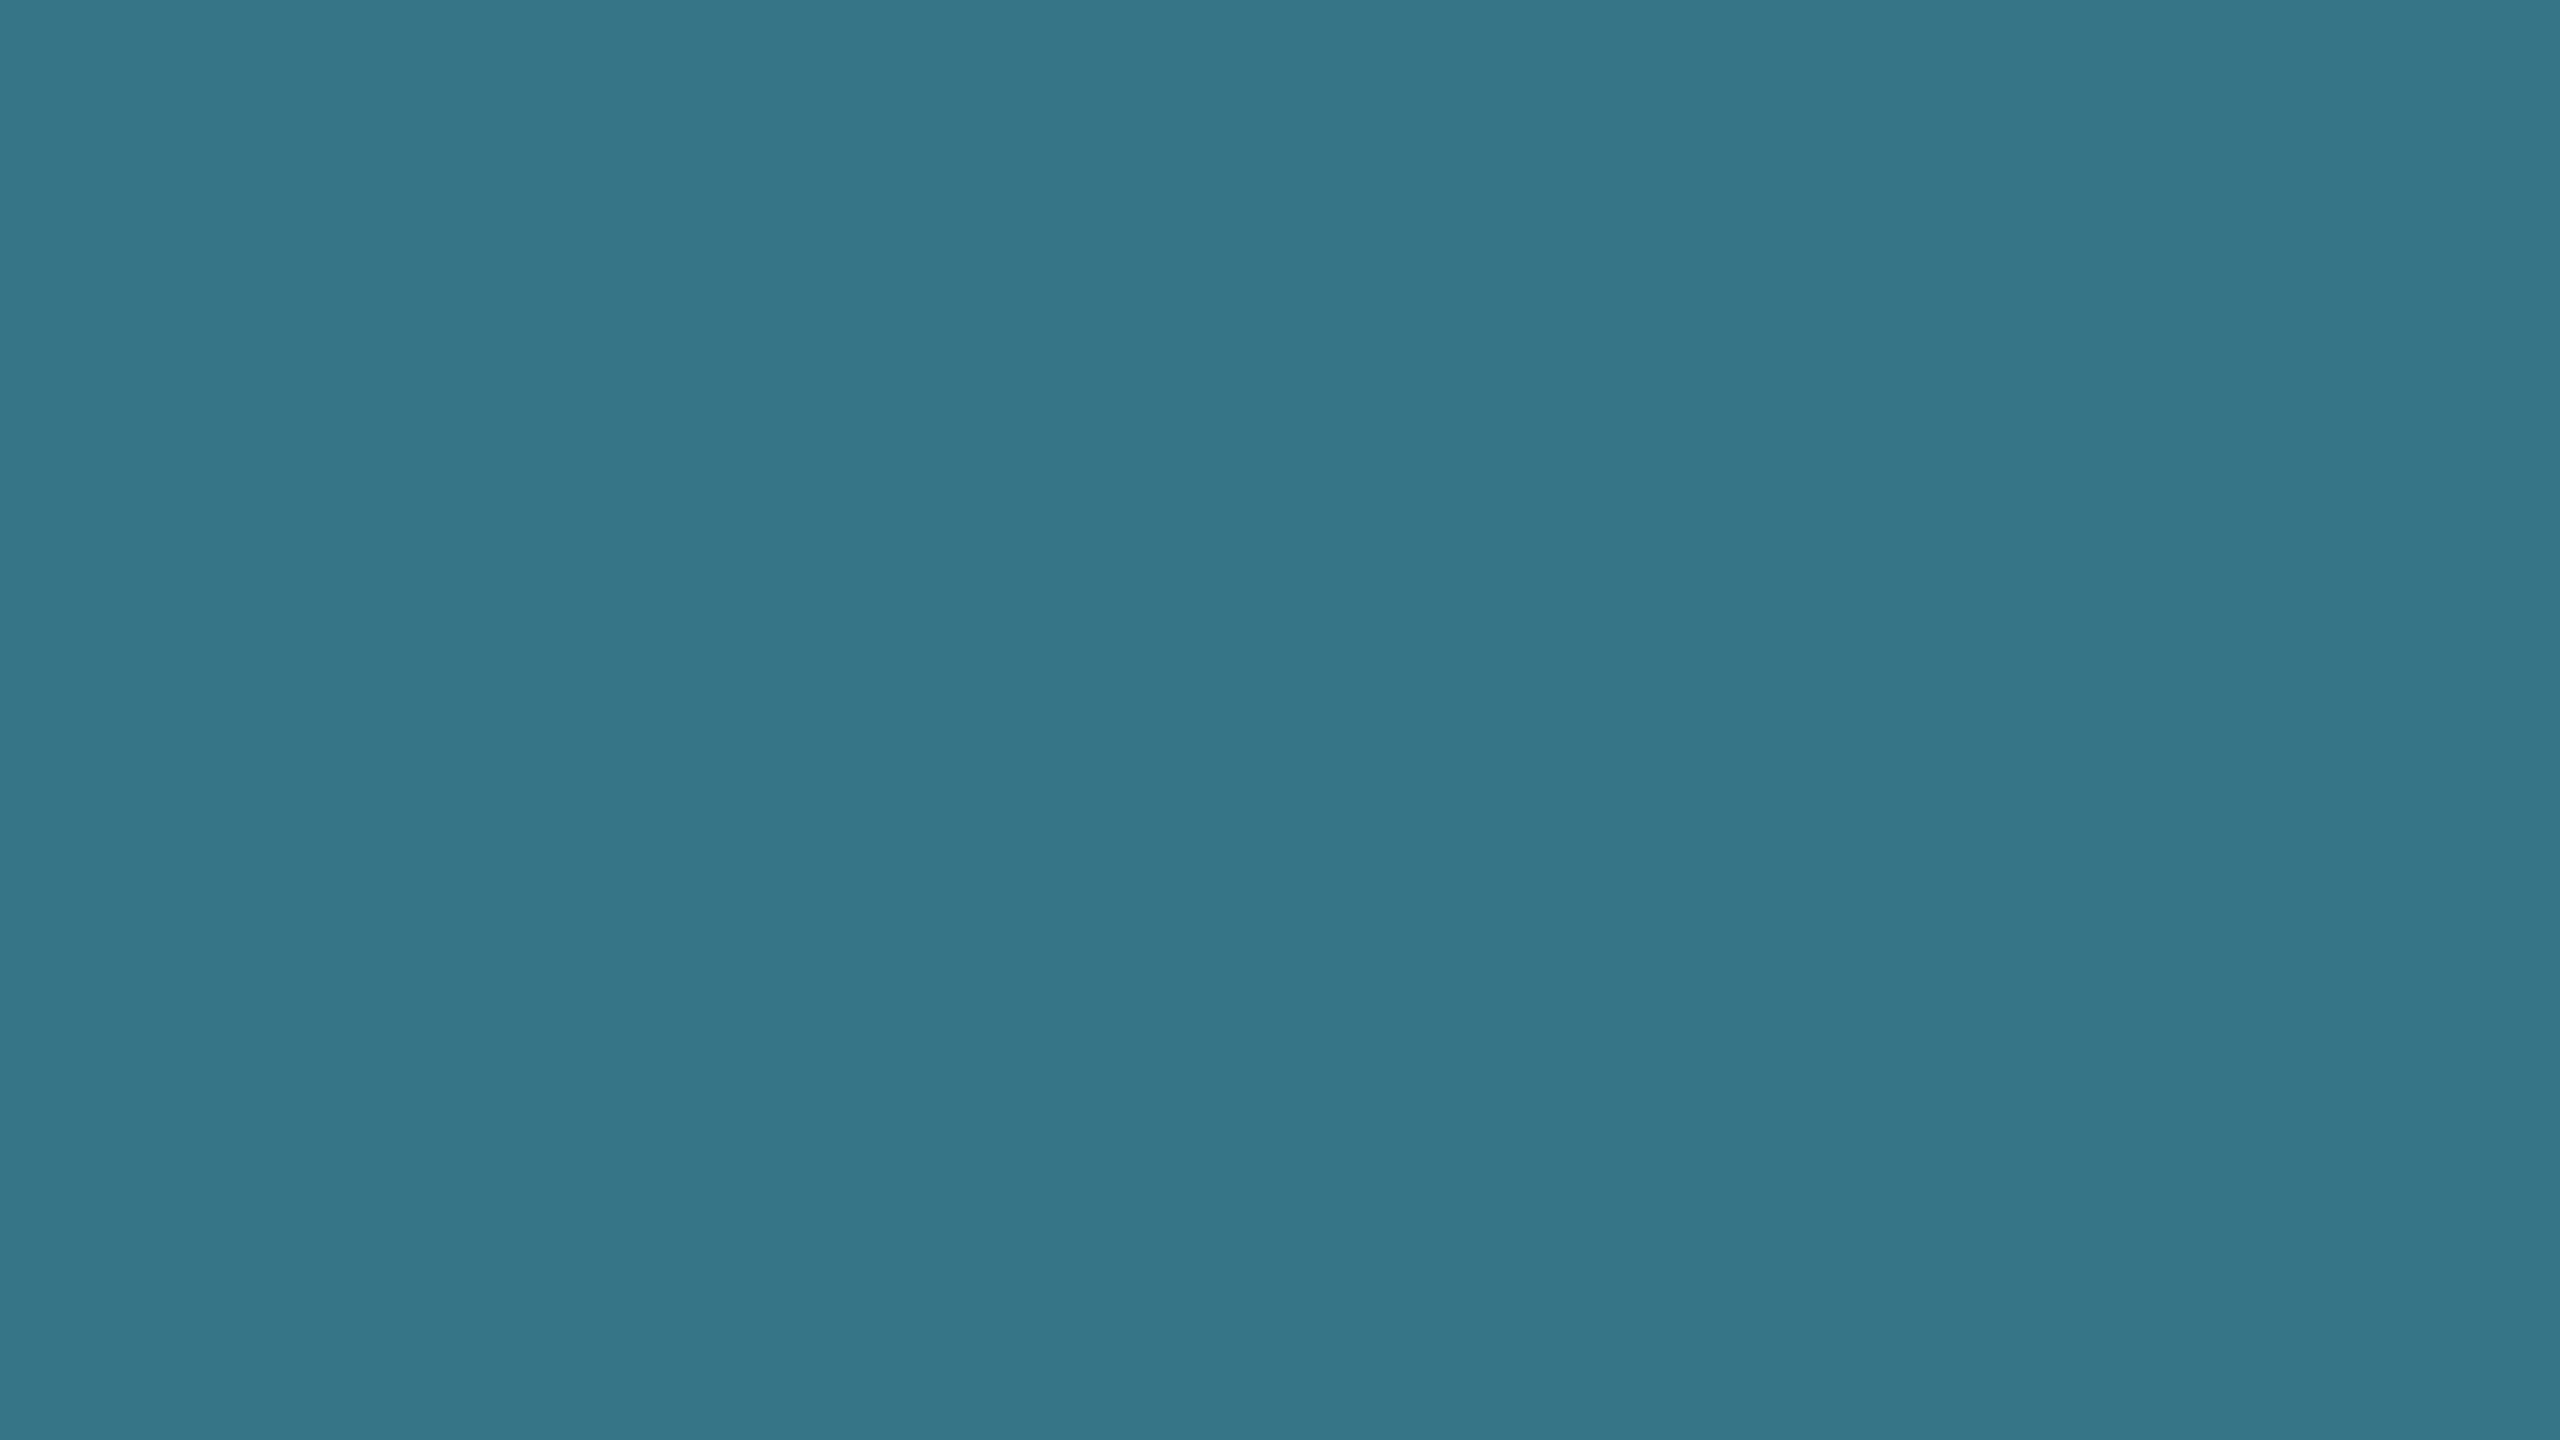 Solid Teal 4K Wallpapers on WallpaperDog